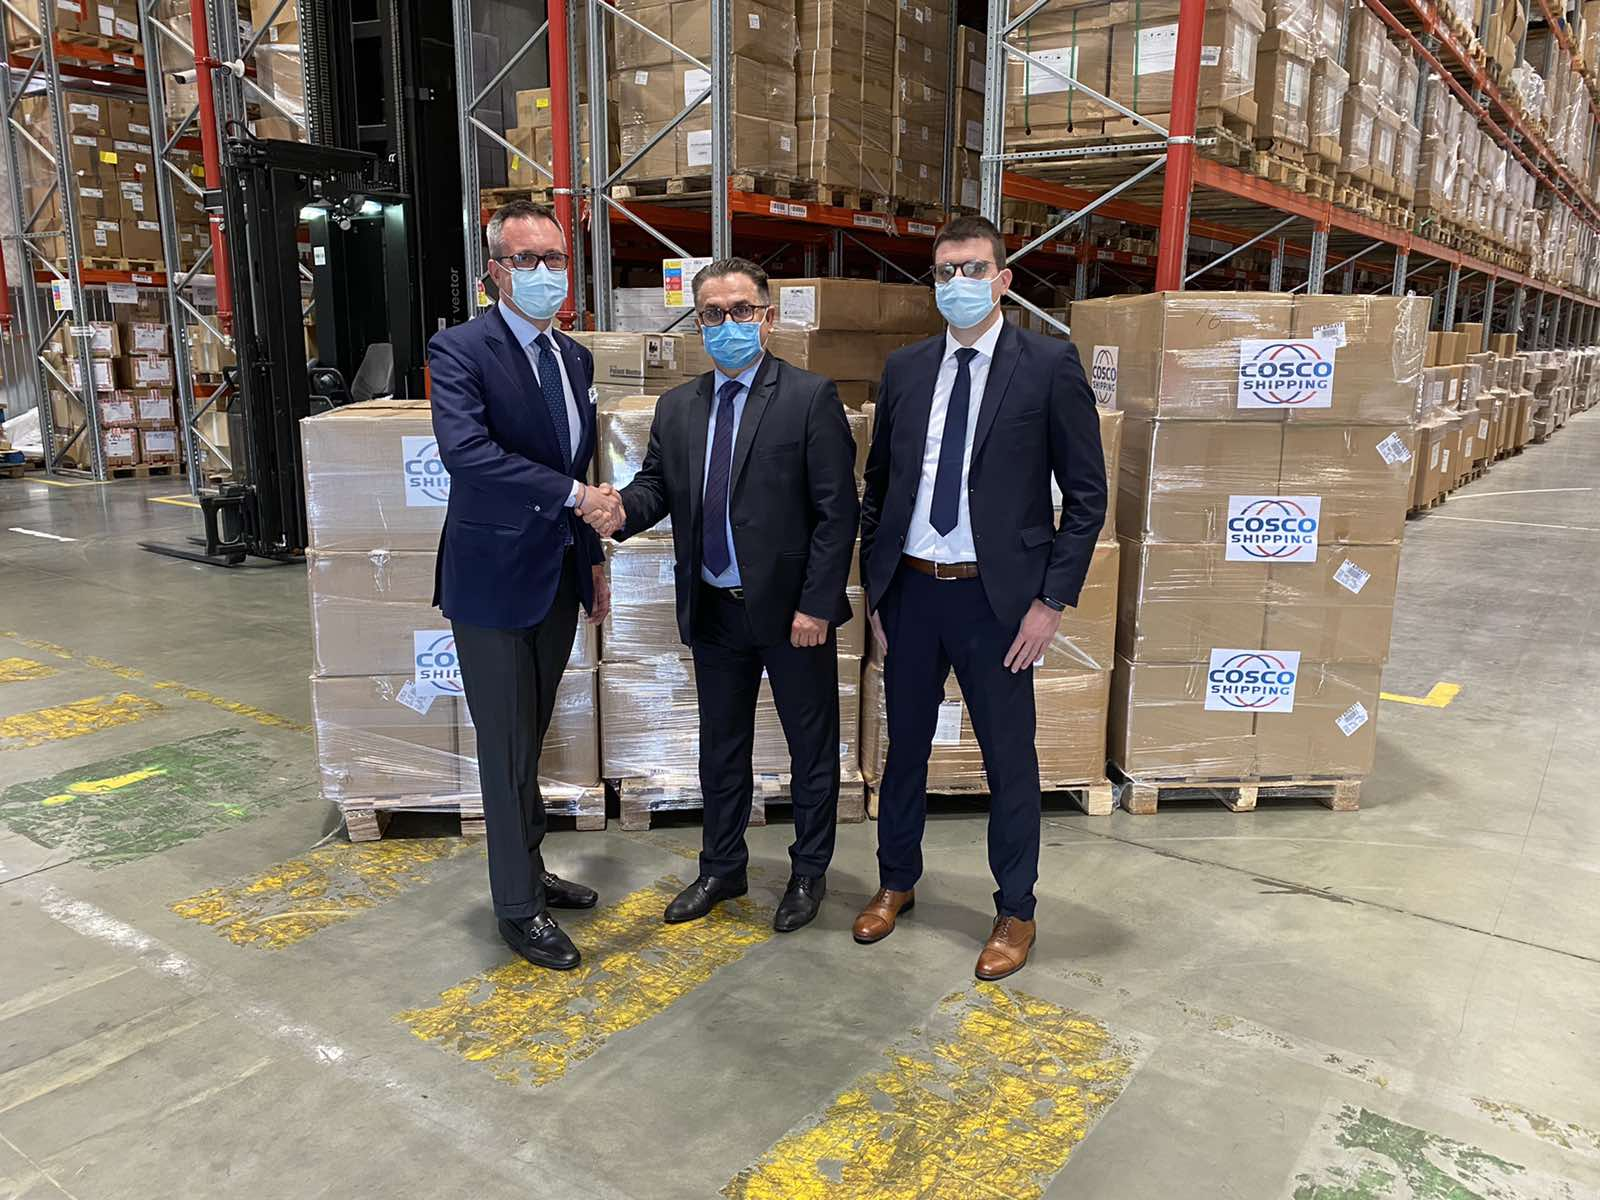 dragon maritime - cosco shipping donation serbia